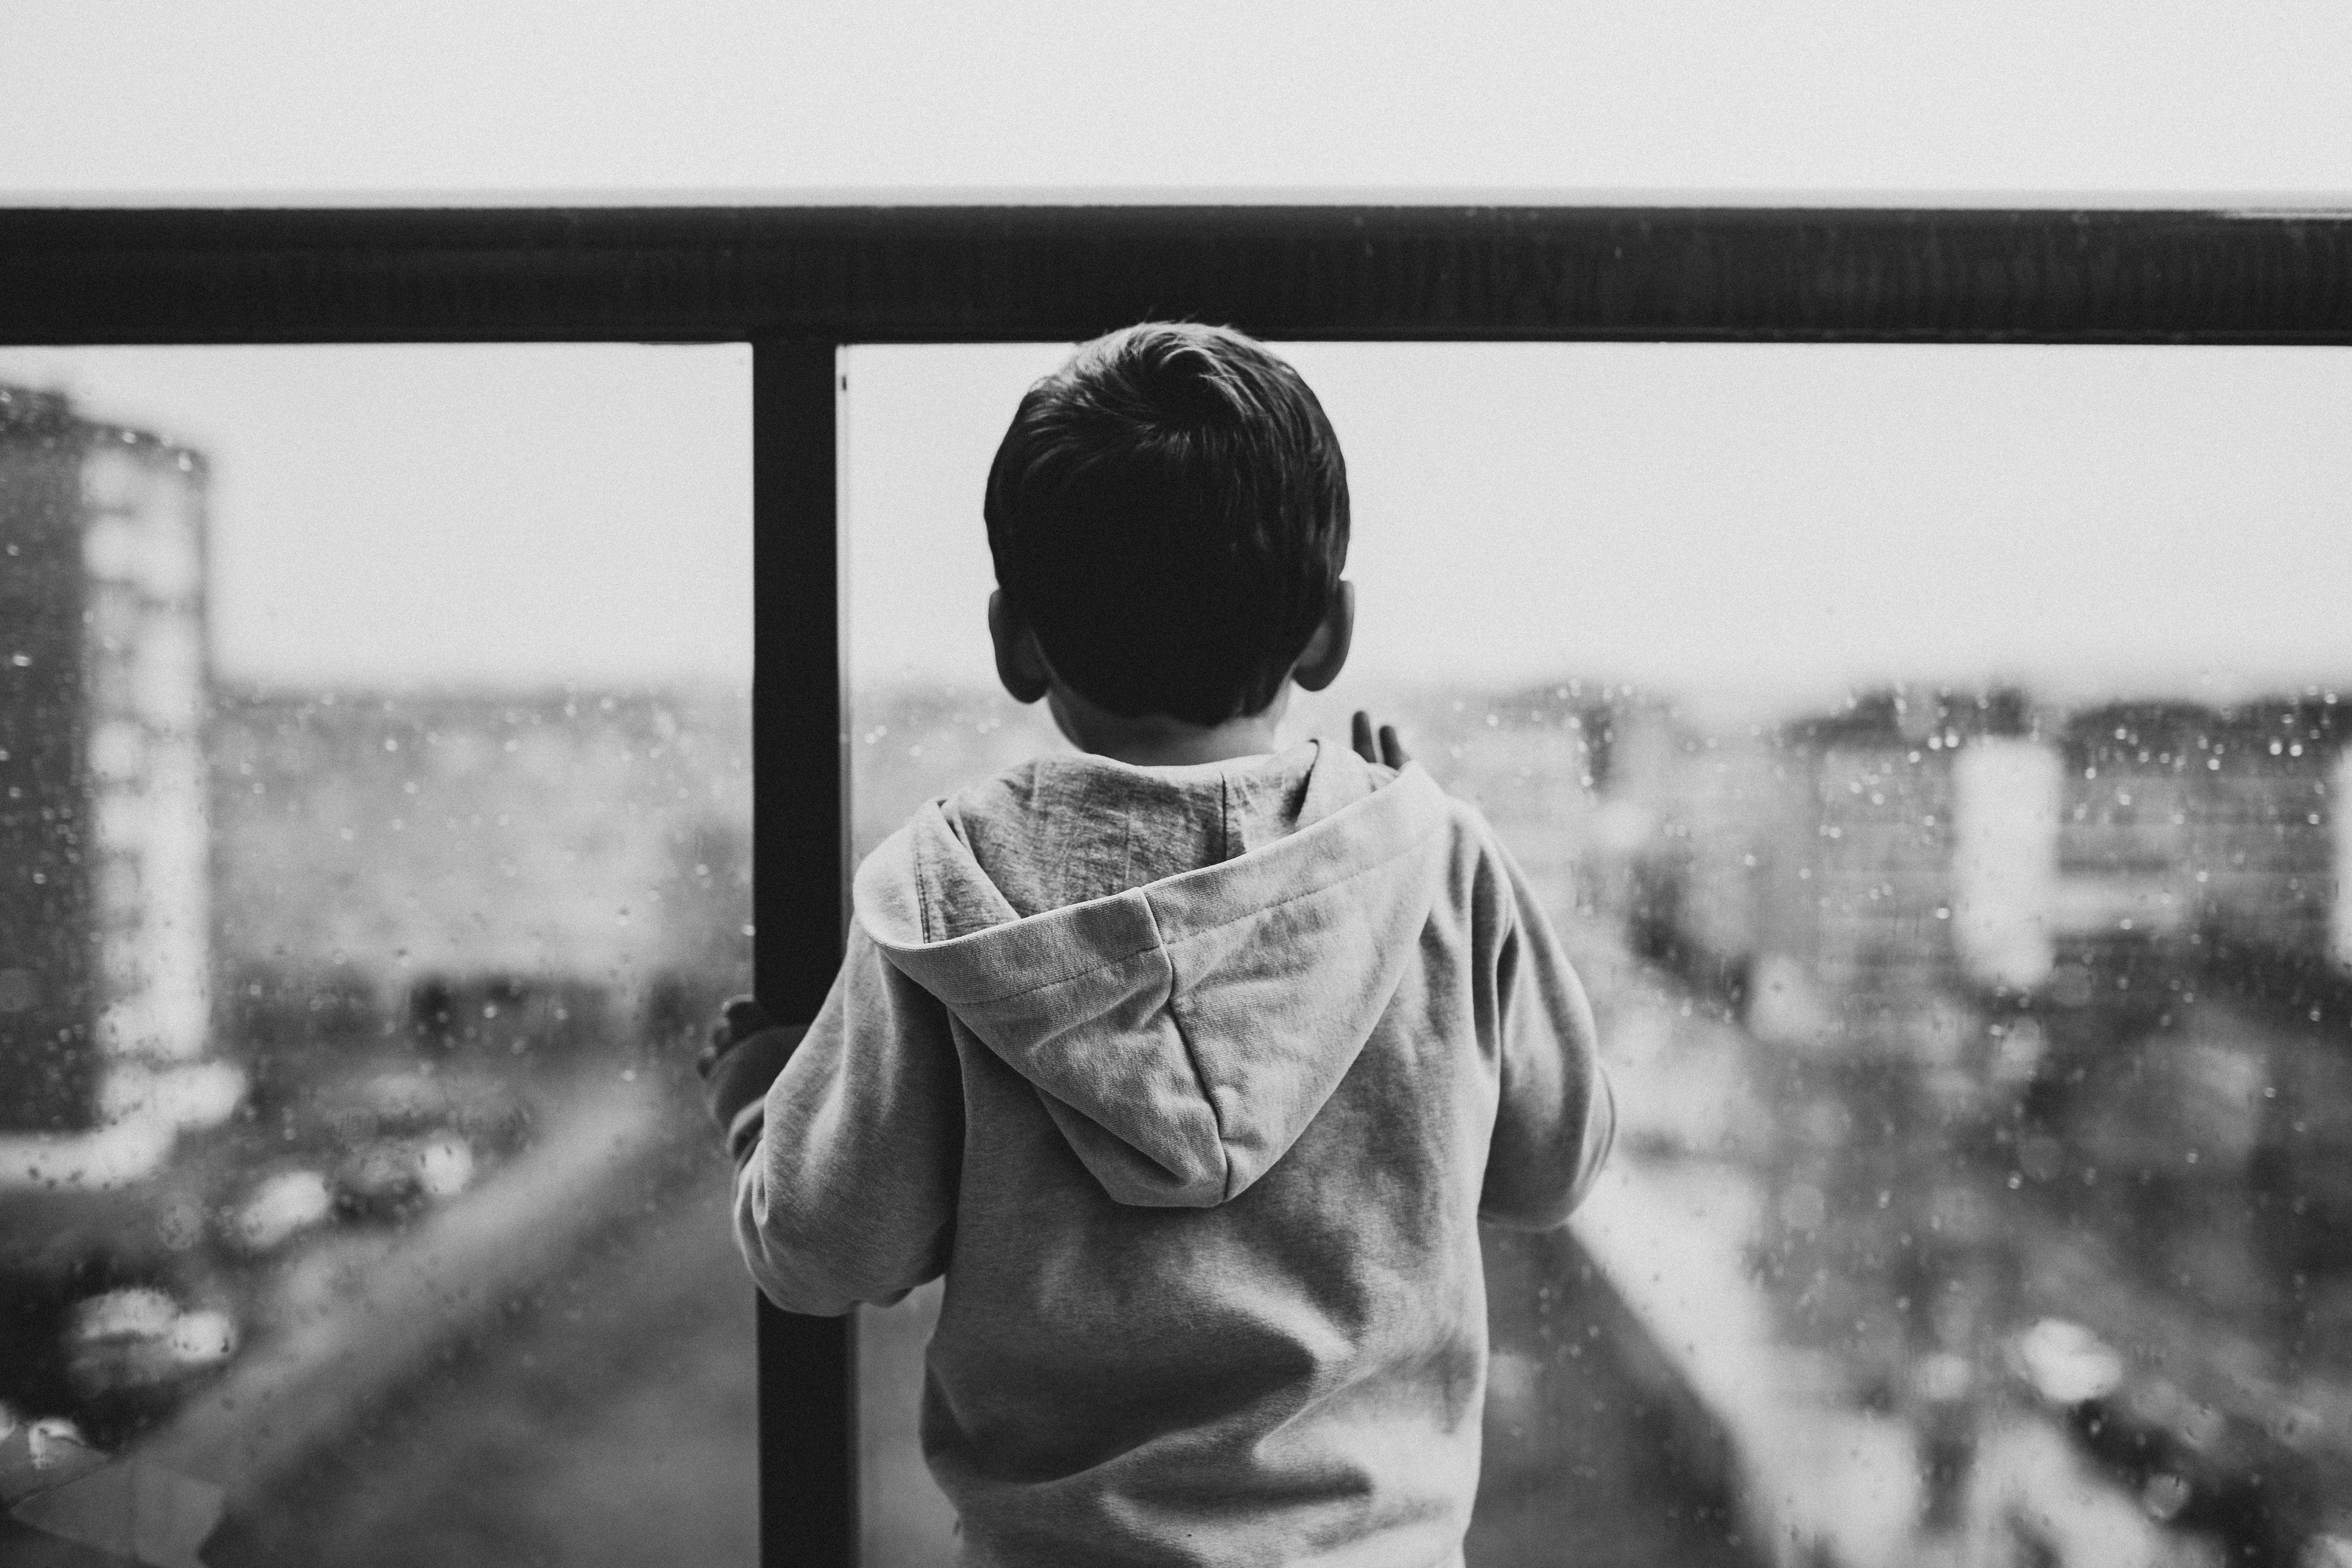 Harmful parenting practices - punishments